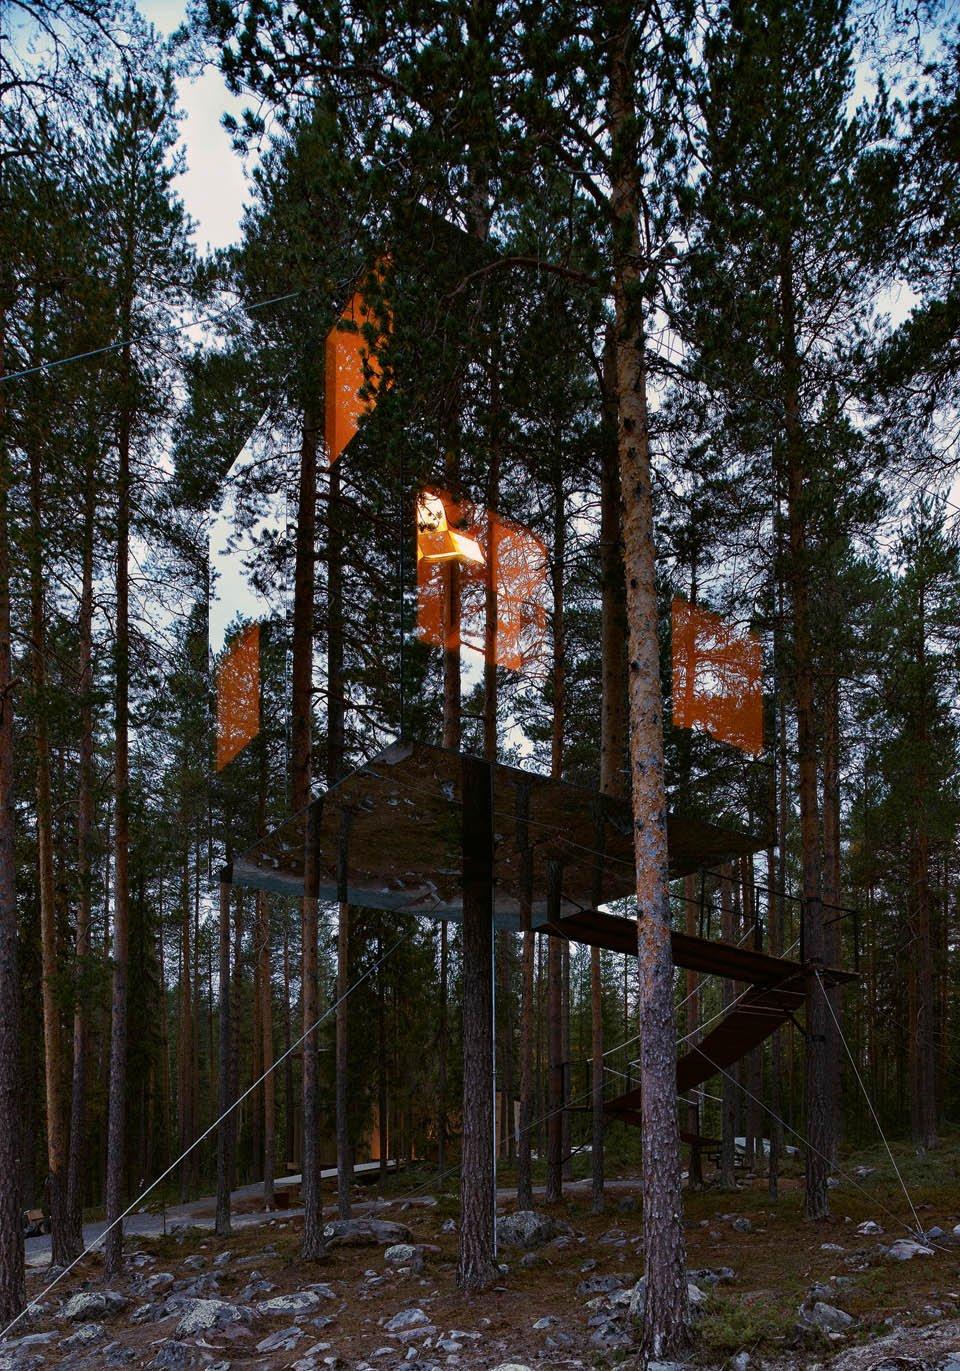 bu_tree_houses_368_1703281537_id_1119918